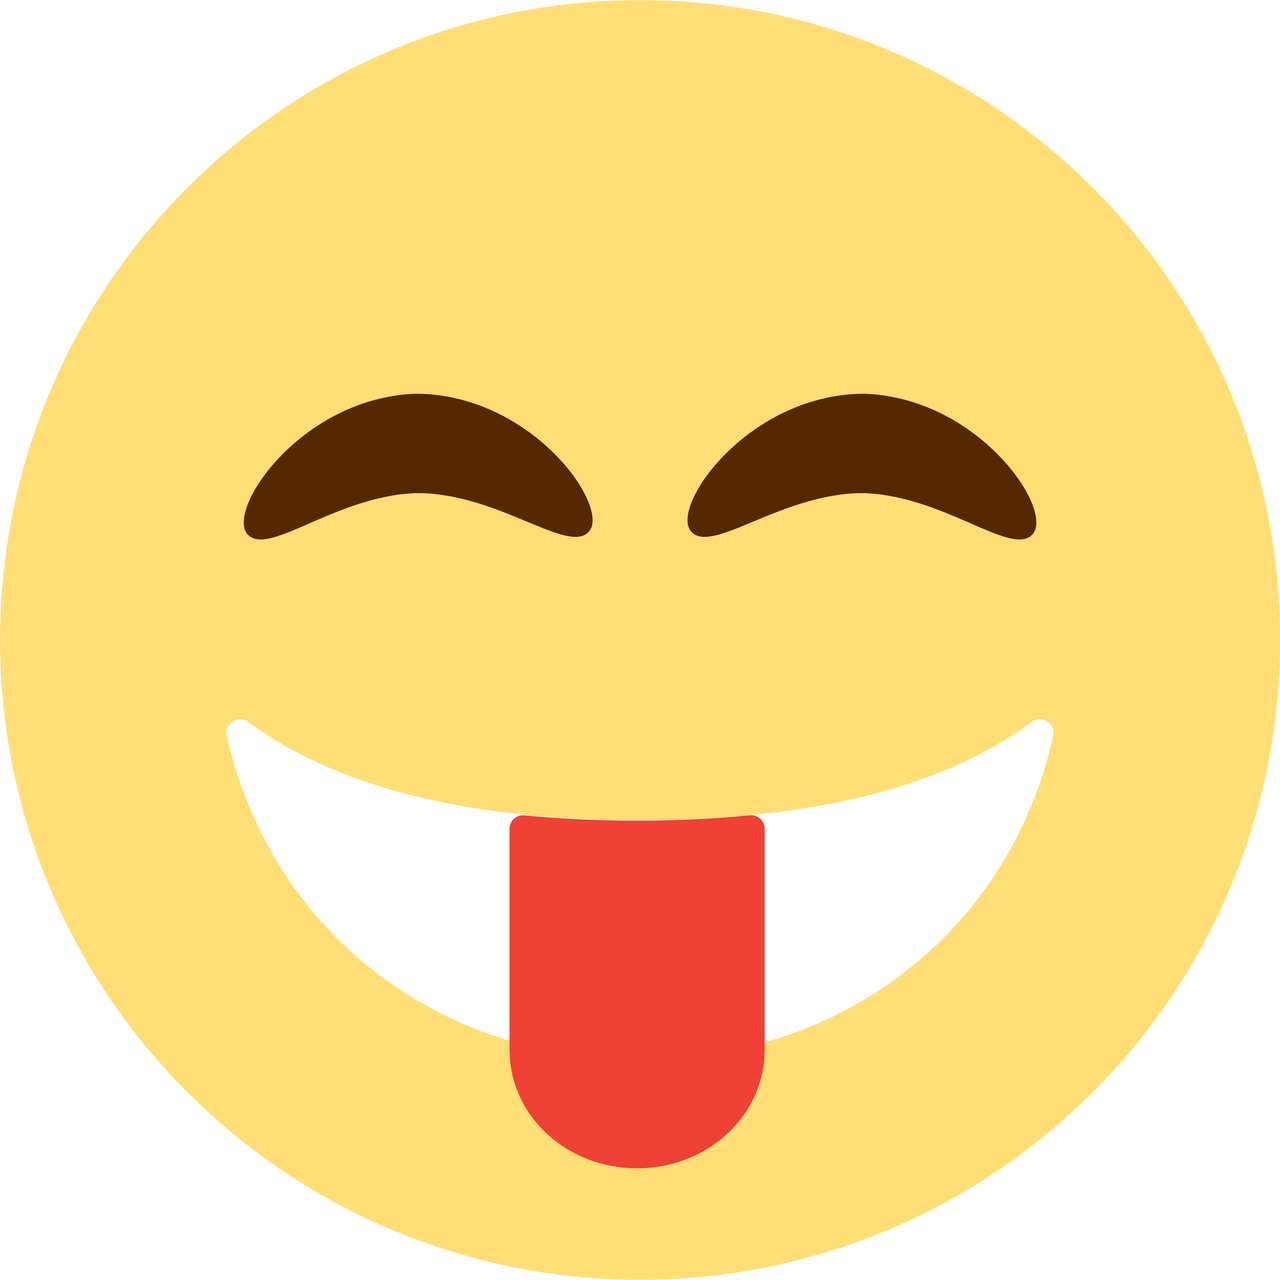 Tongue Emoji SVG Cut File